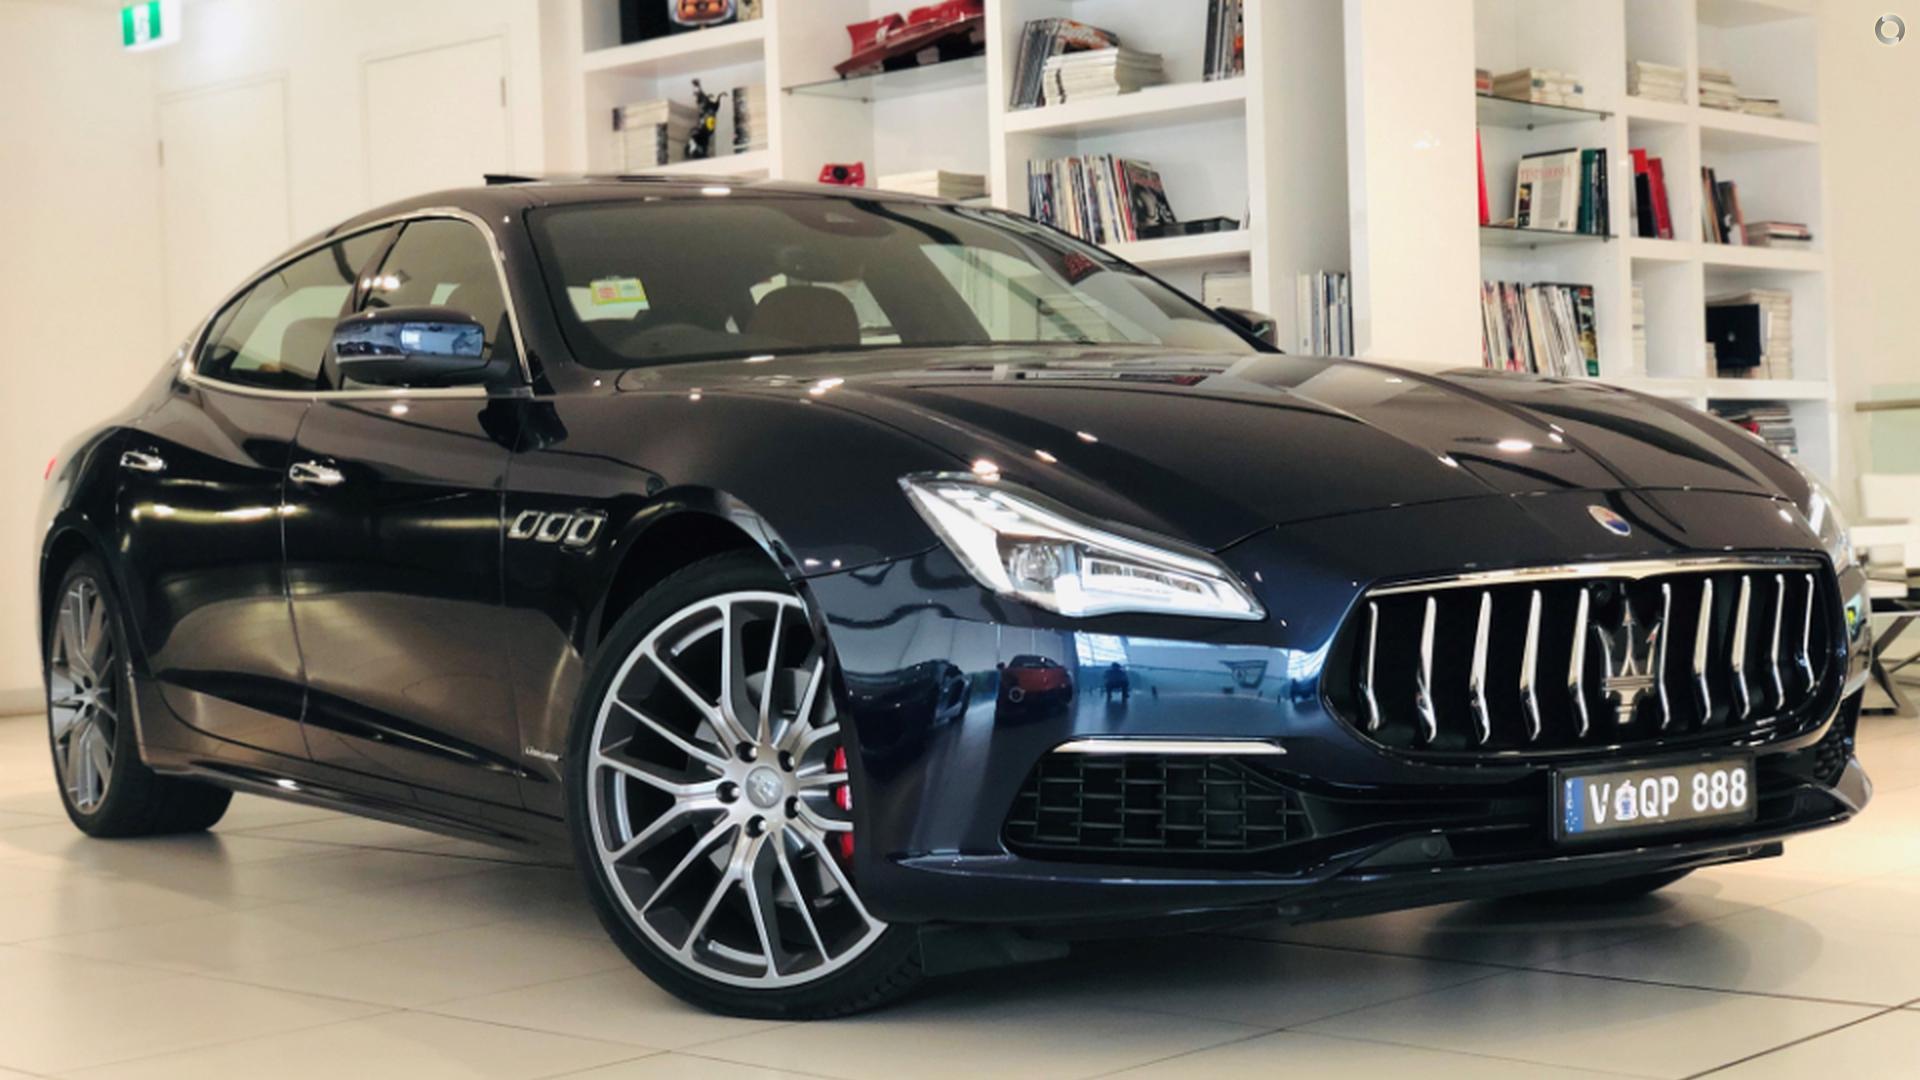 2018 Maserati Quattroporte GranLusso M156